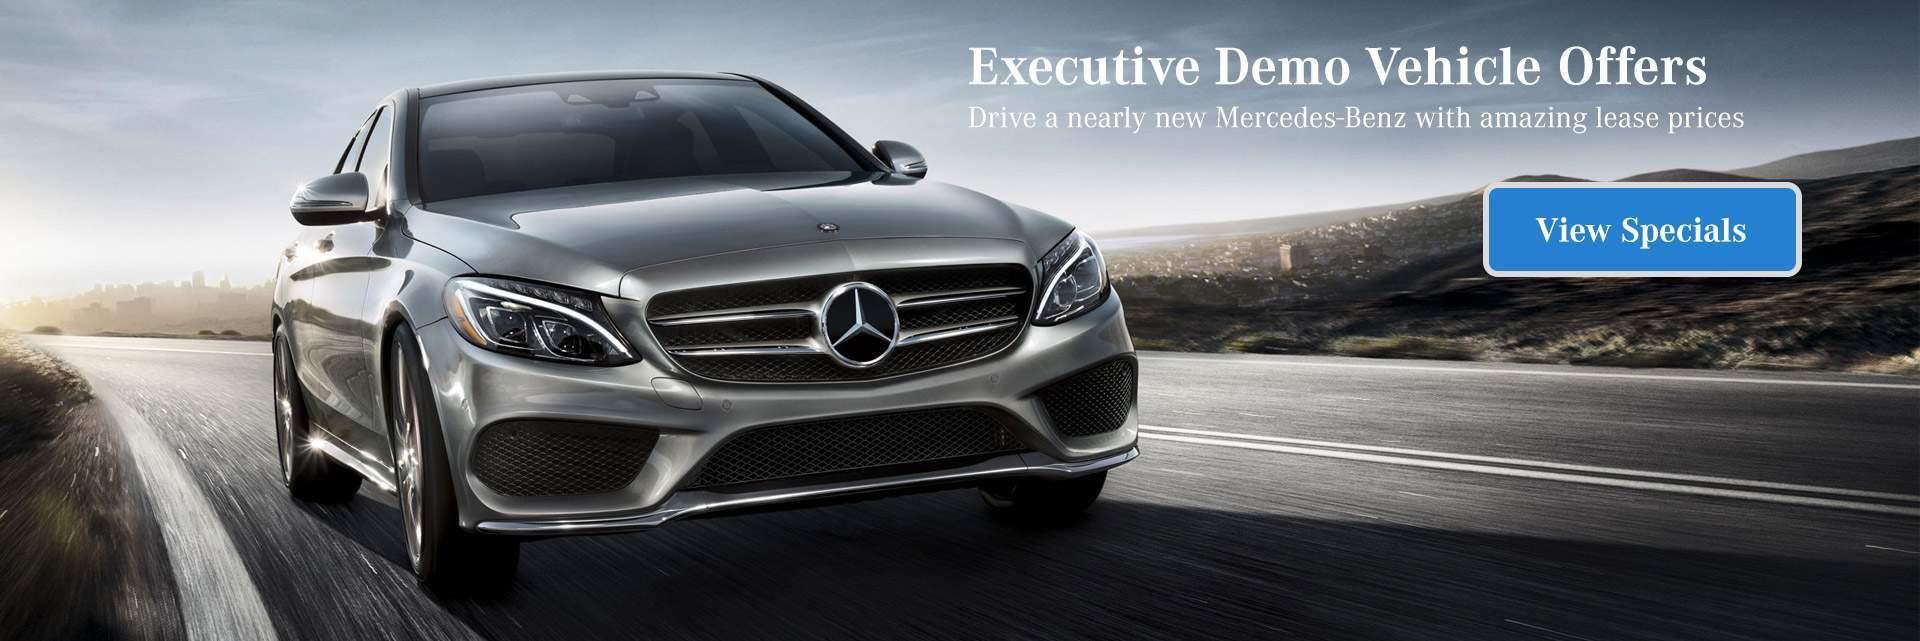 Mercedes benz dealership merriam ks used cars aristocrat for Mercedes benz customer support